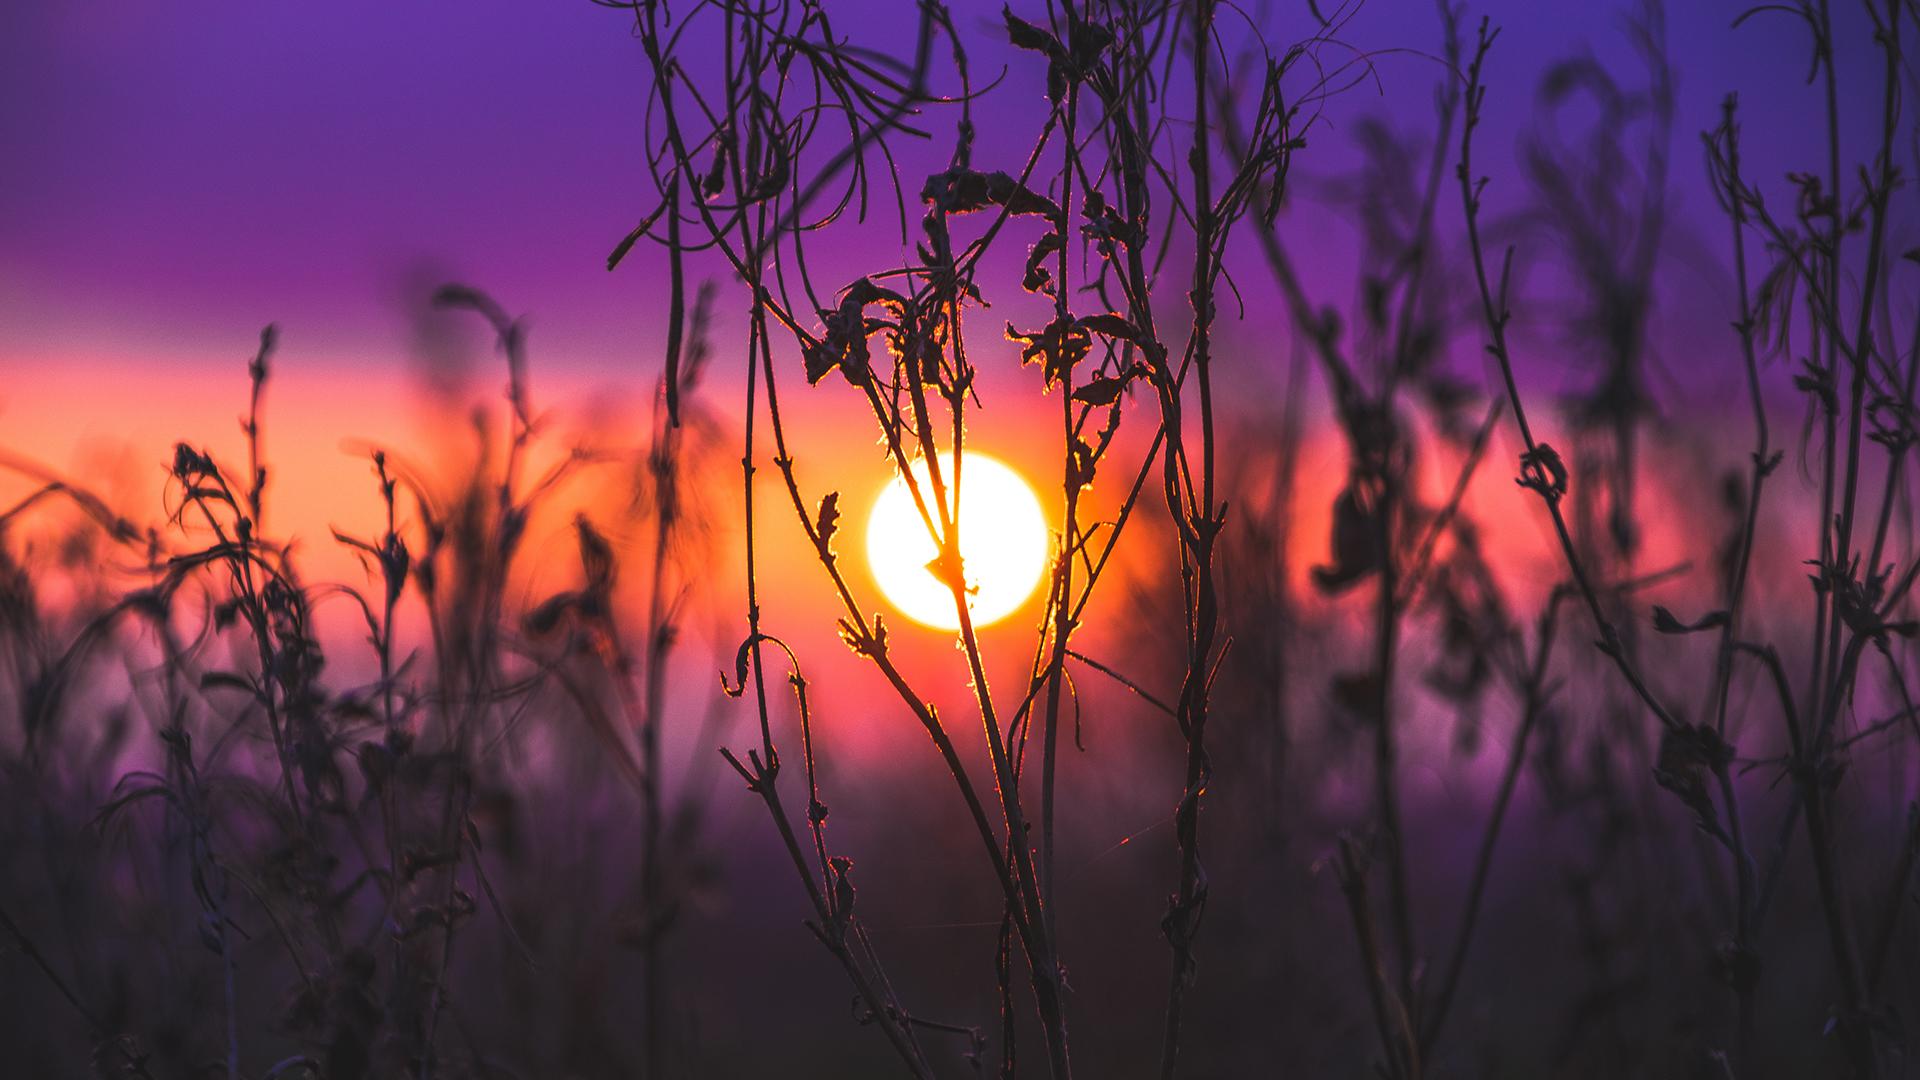 General 1920x1080 sunrise purple background Sun plants macro nature